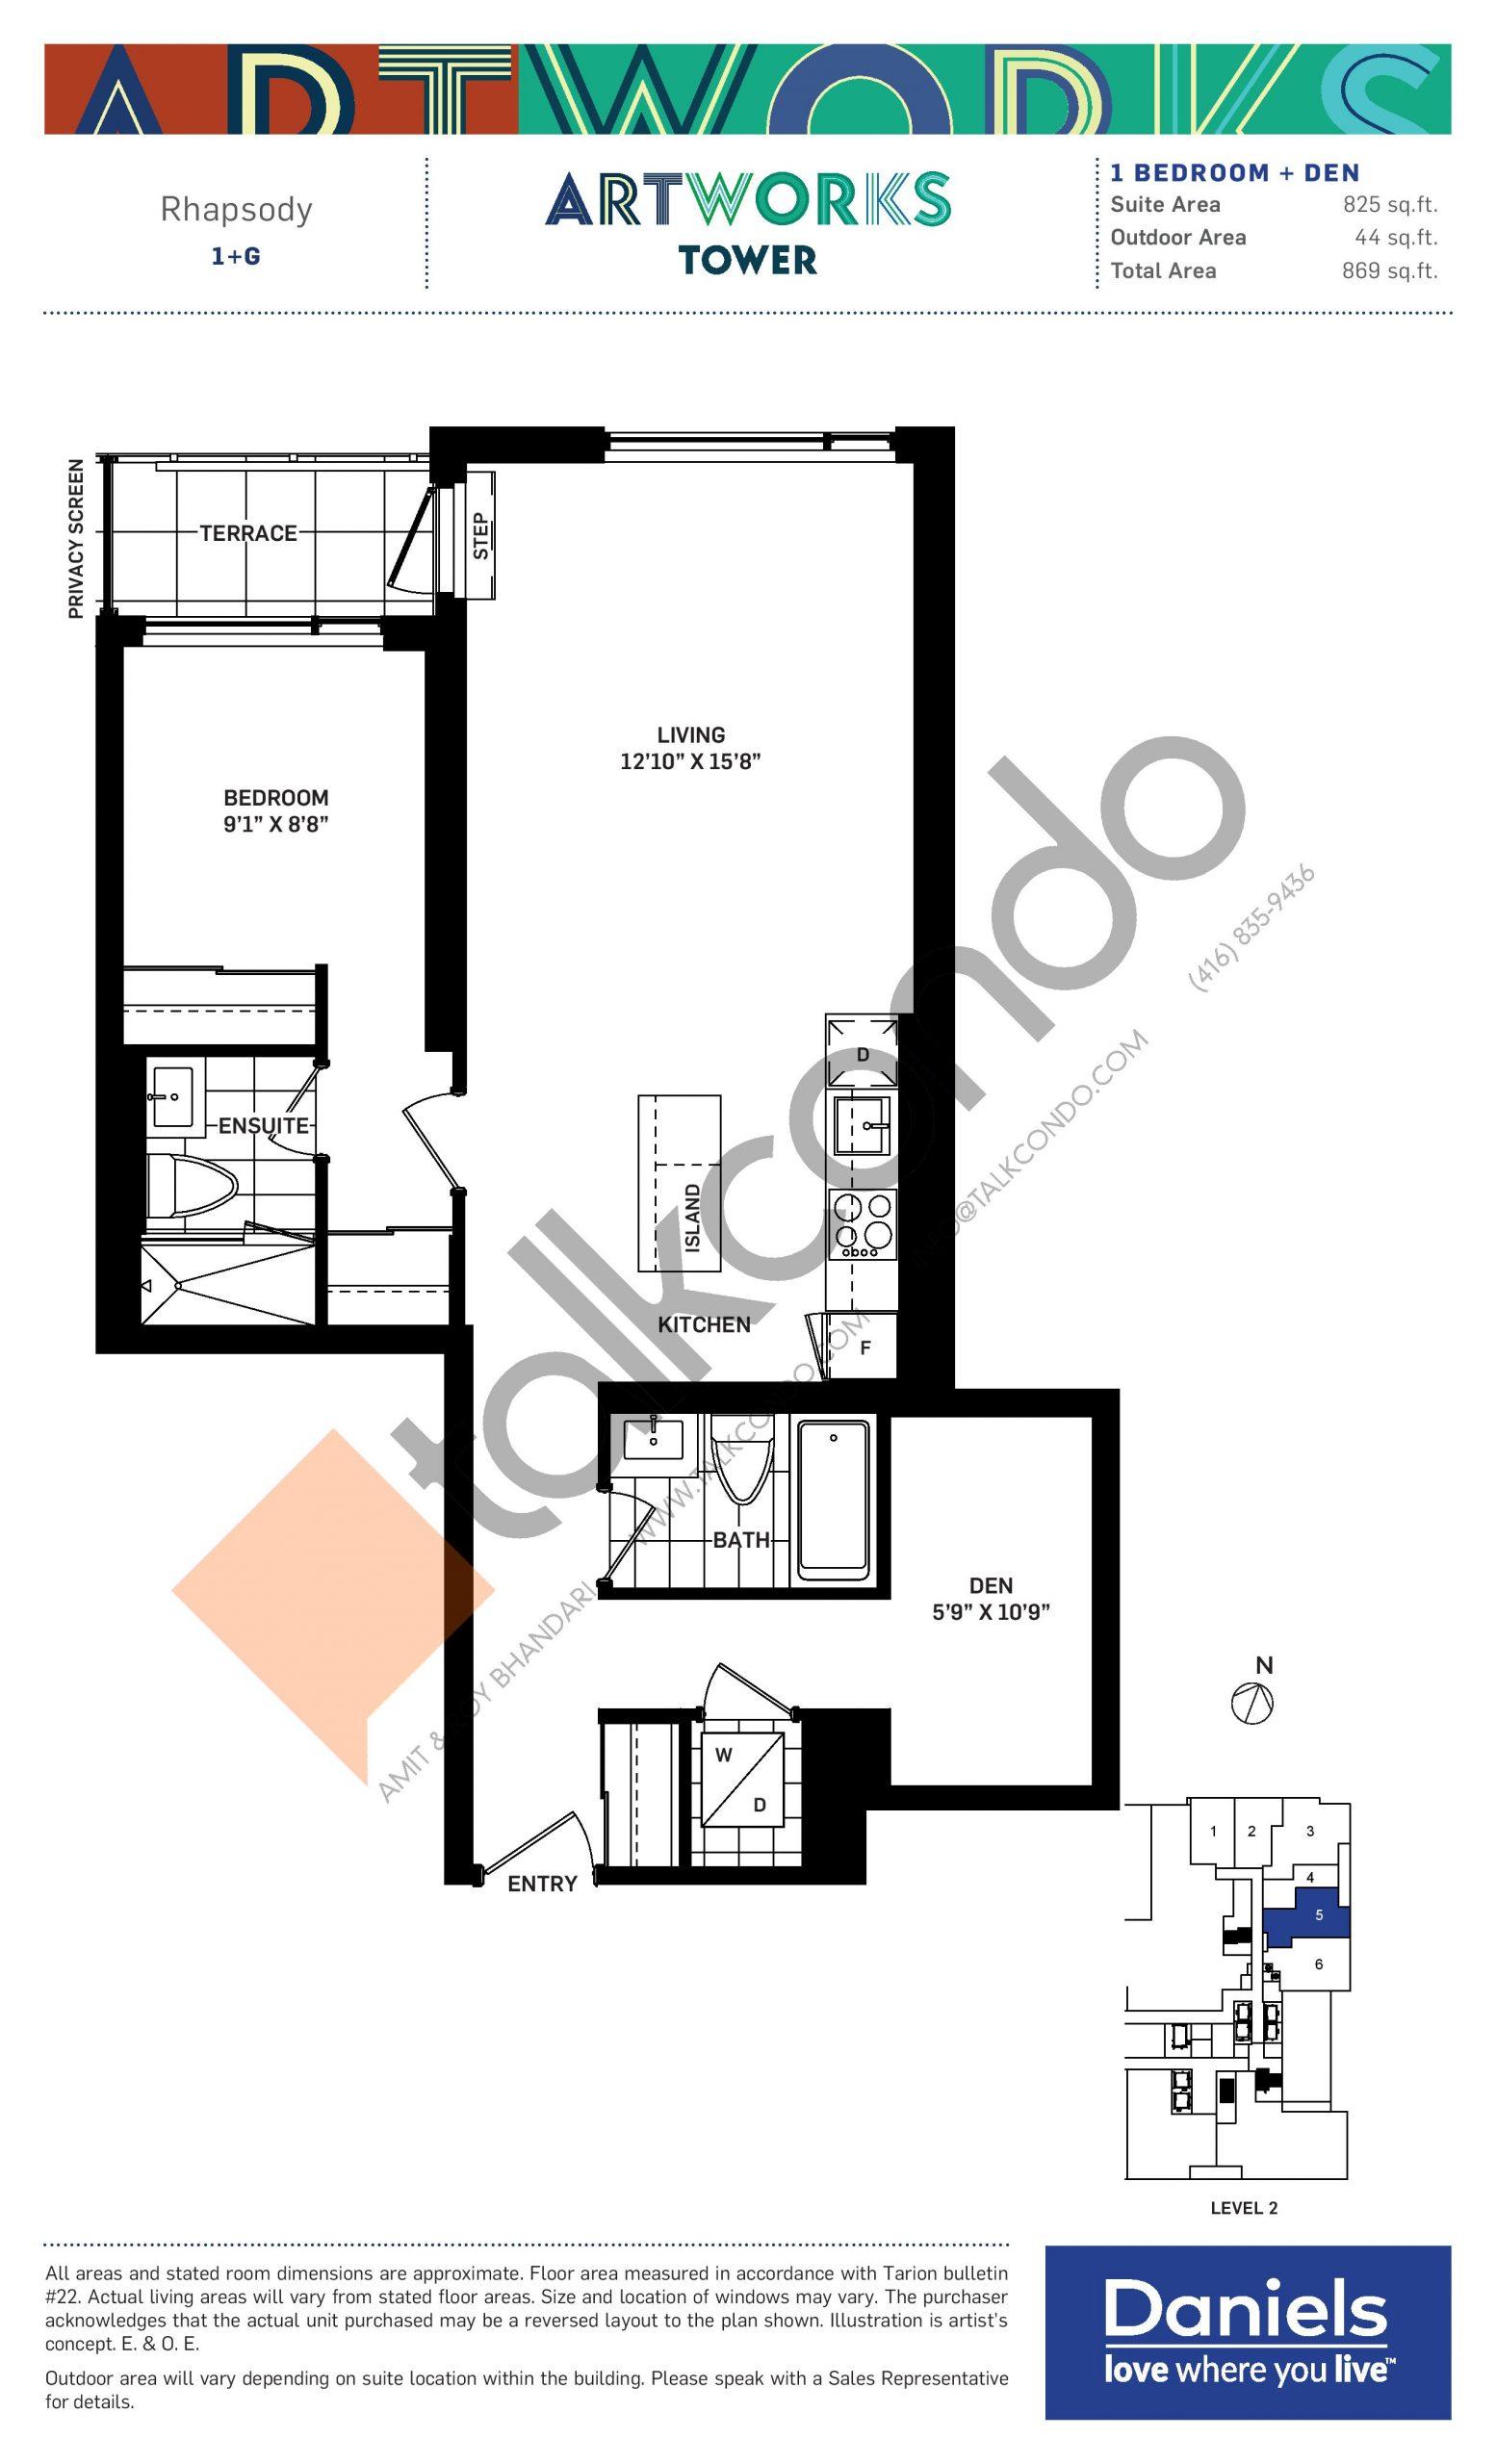 Rhapsody Floor Plan at Artworks Tower Condos - 825 sq.ft